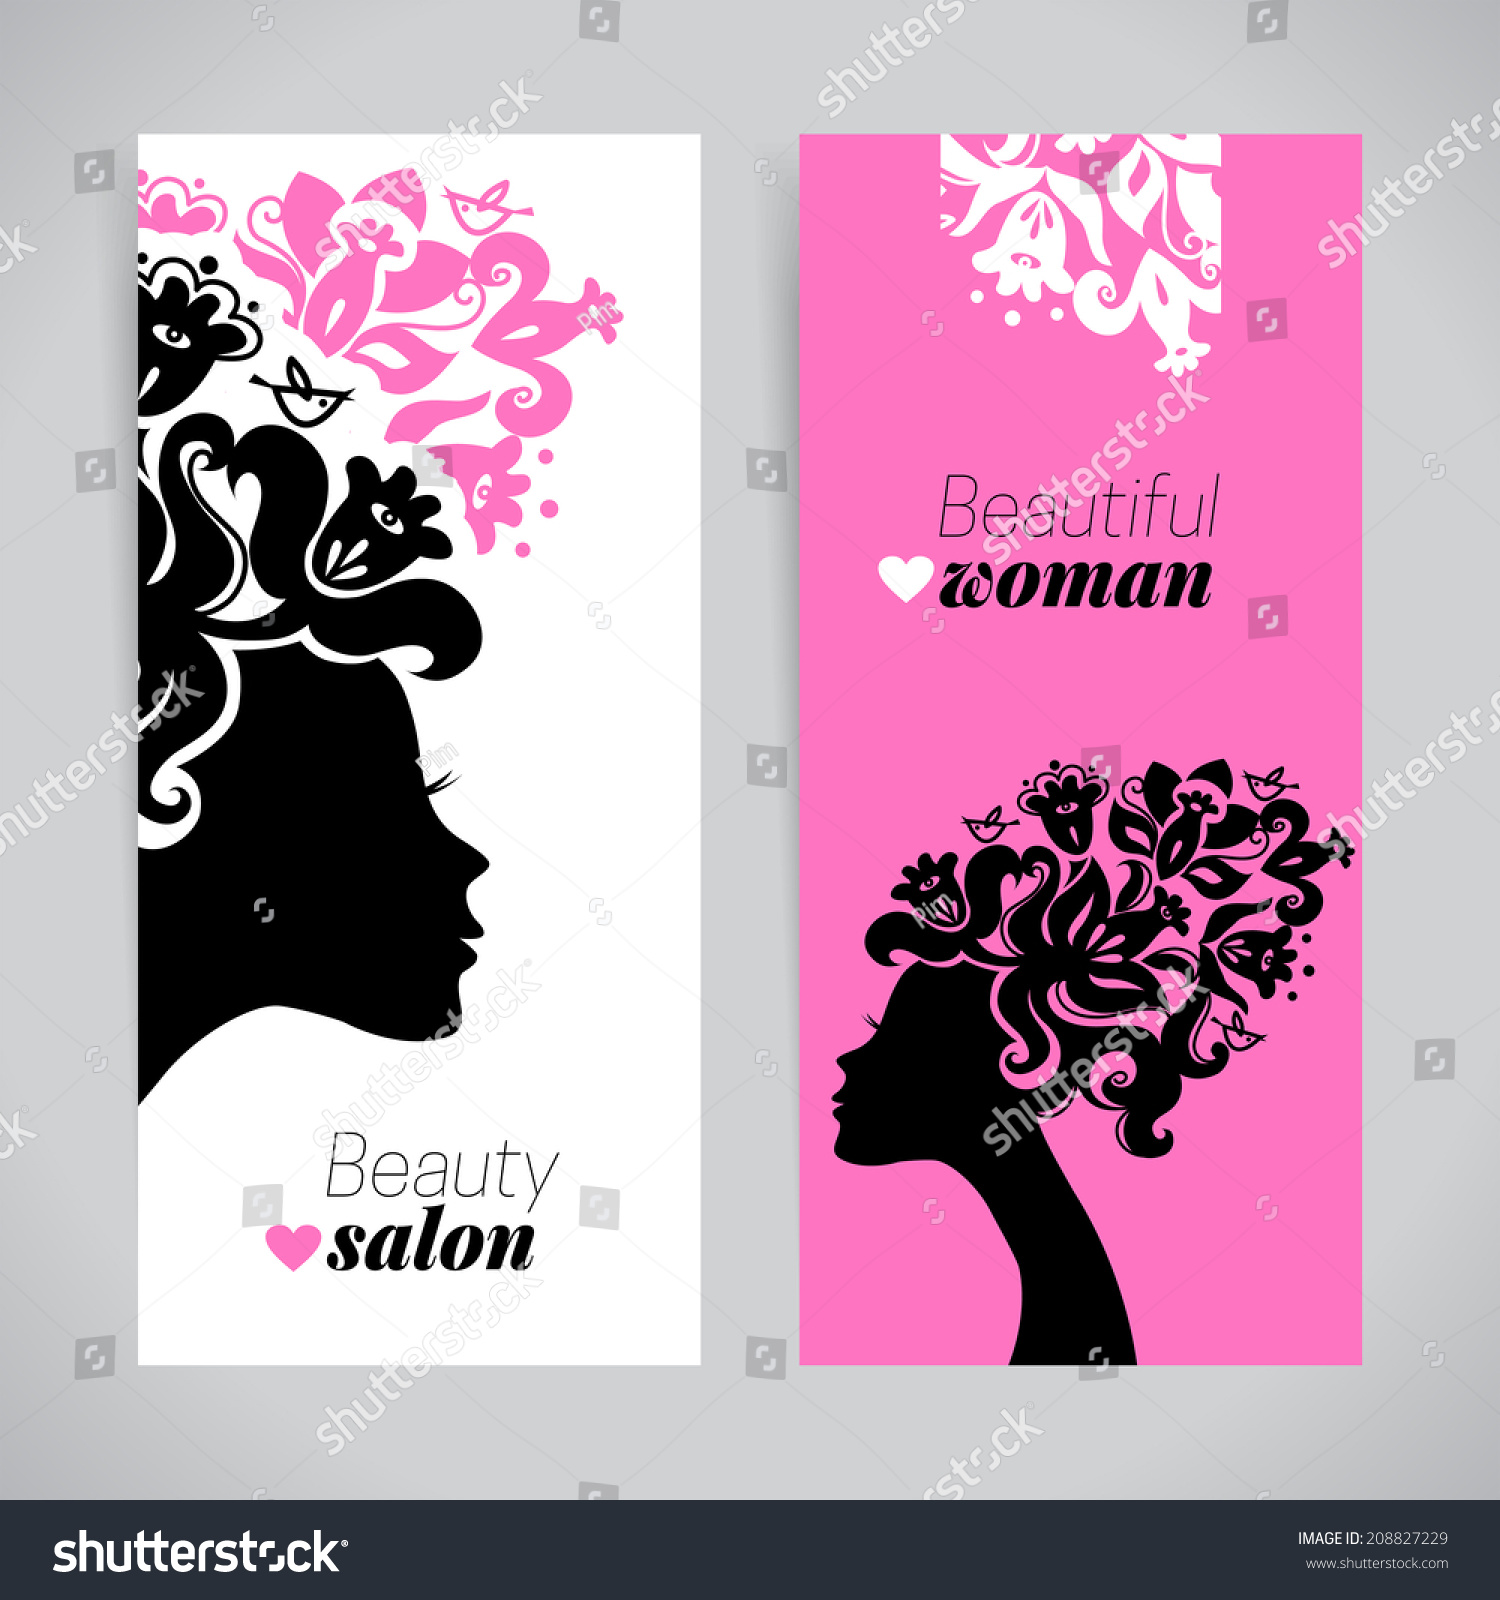 banners beautiful women silhouettes flowers beauty stock